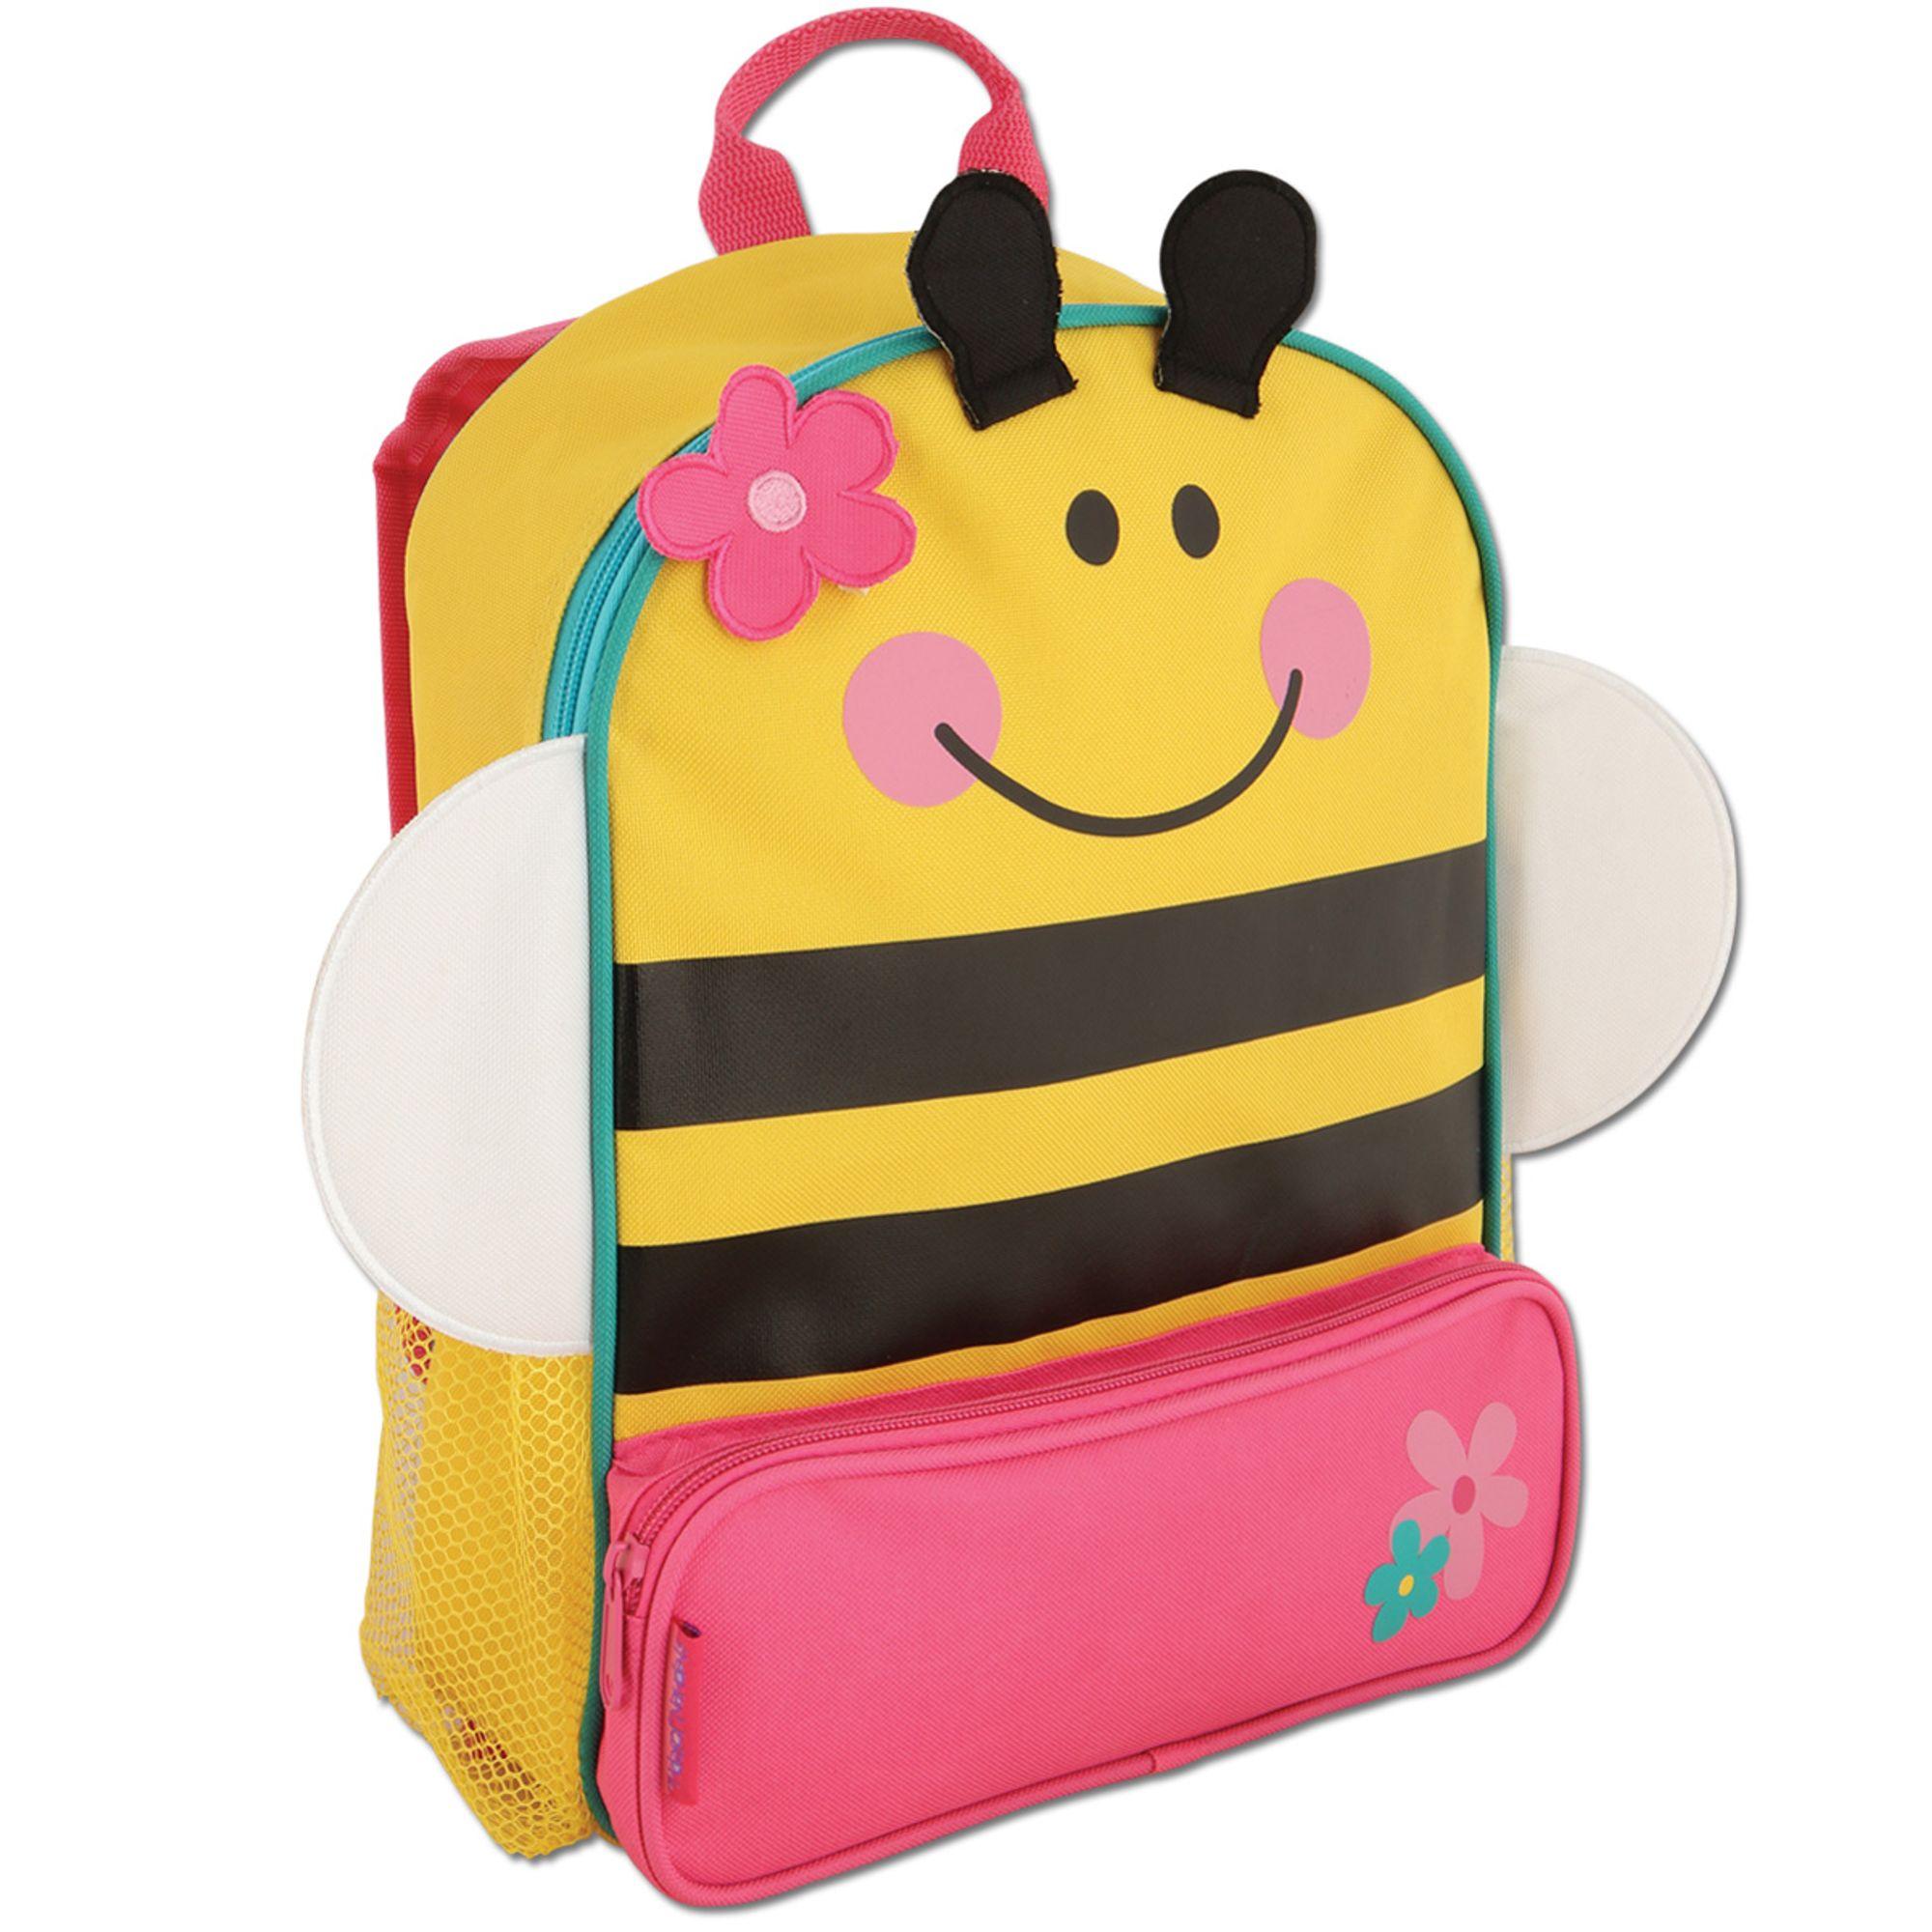 mochila-escolar-abelhinha-stephen-joseph